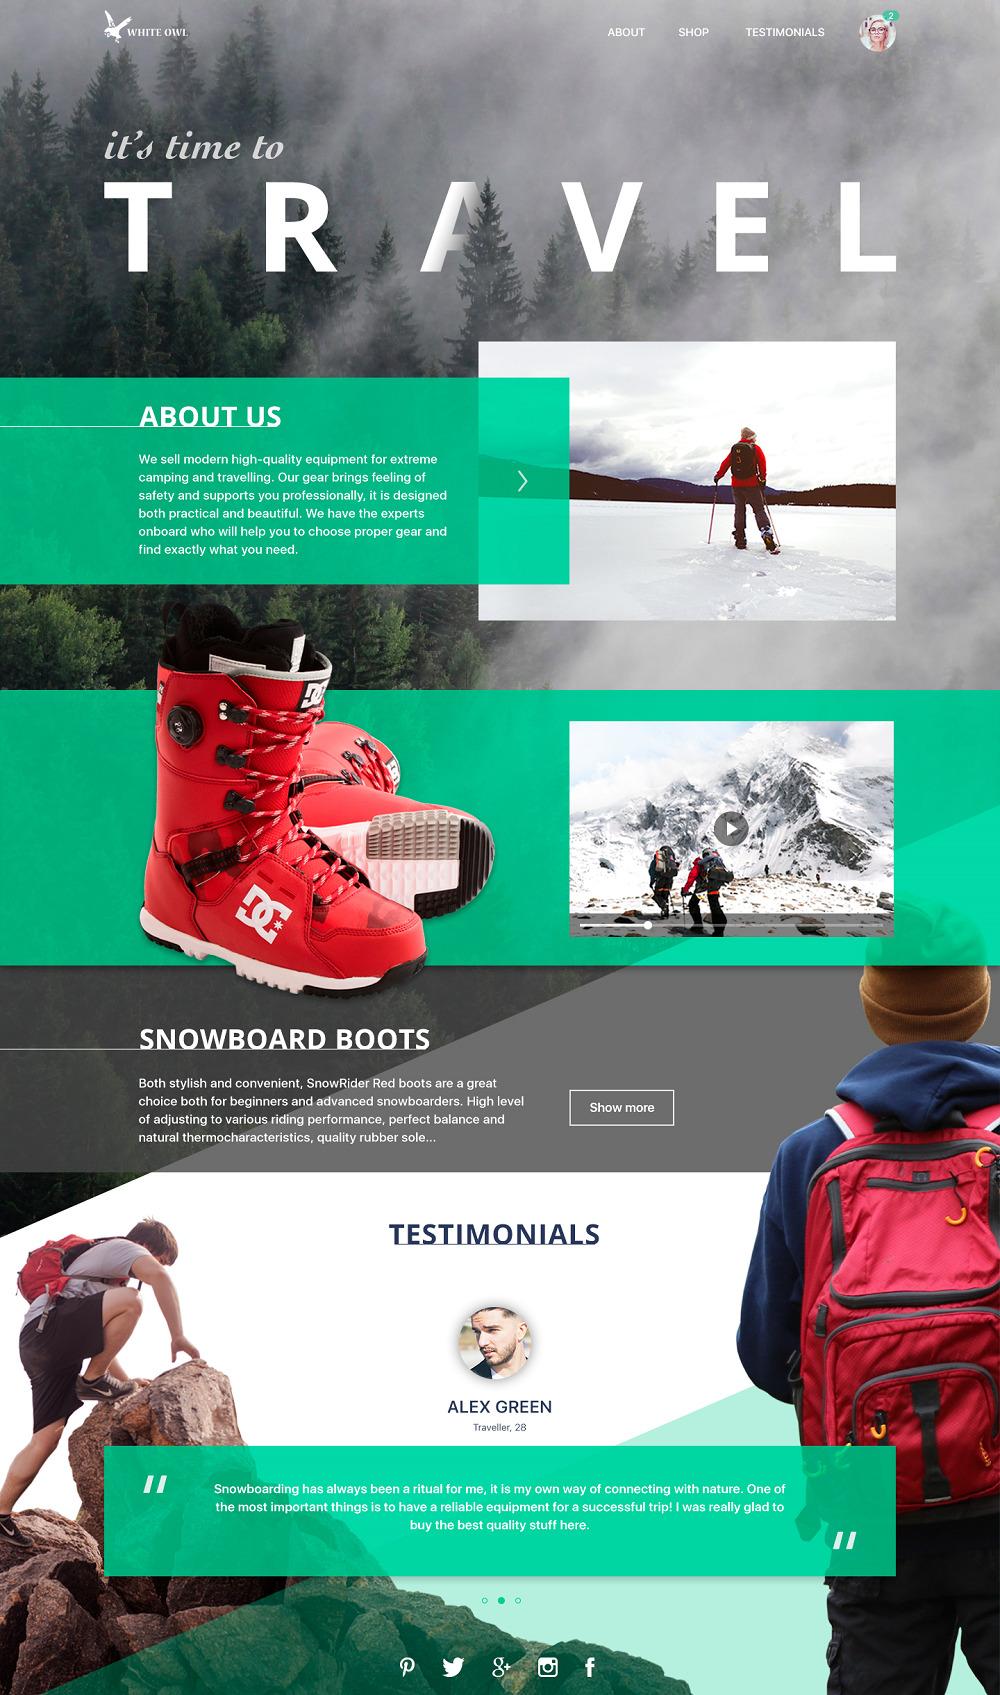 tubikstudio_travel_gear_landing_page